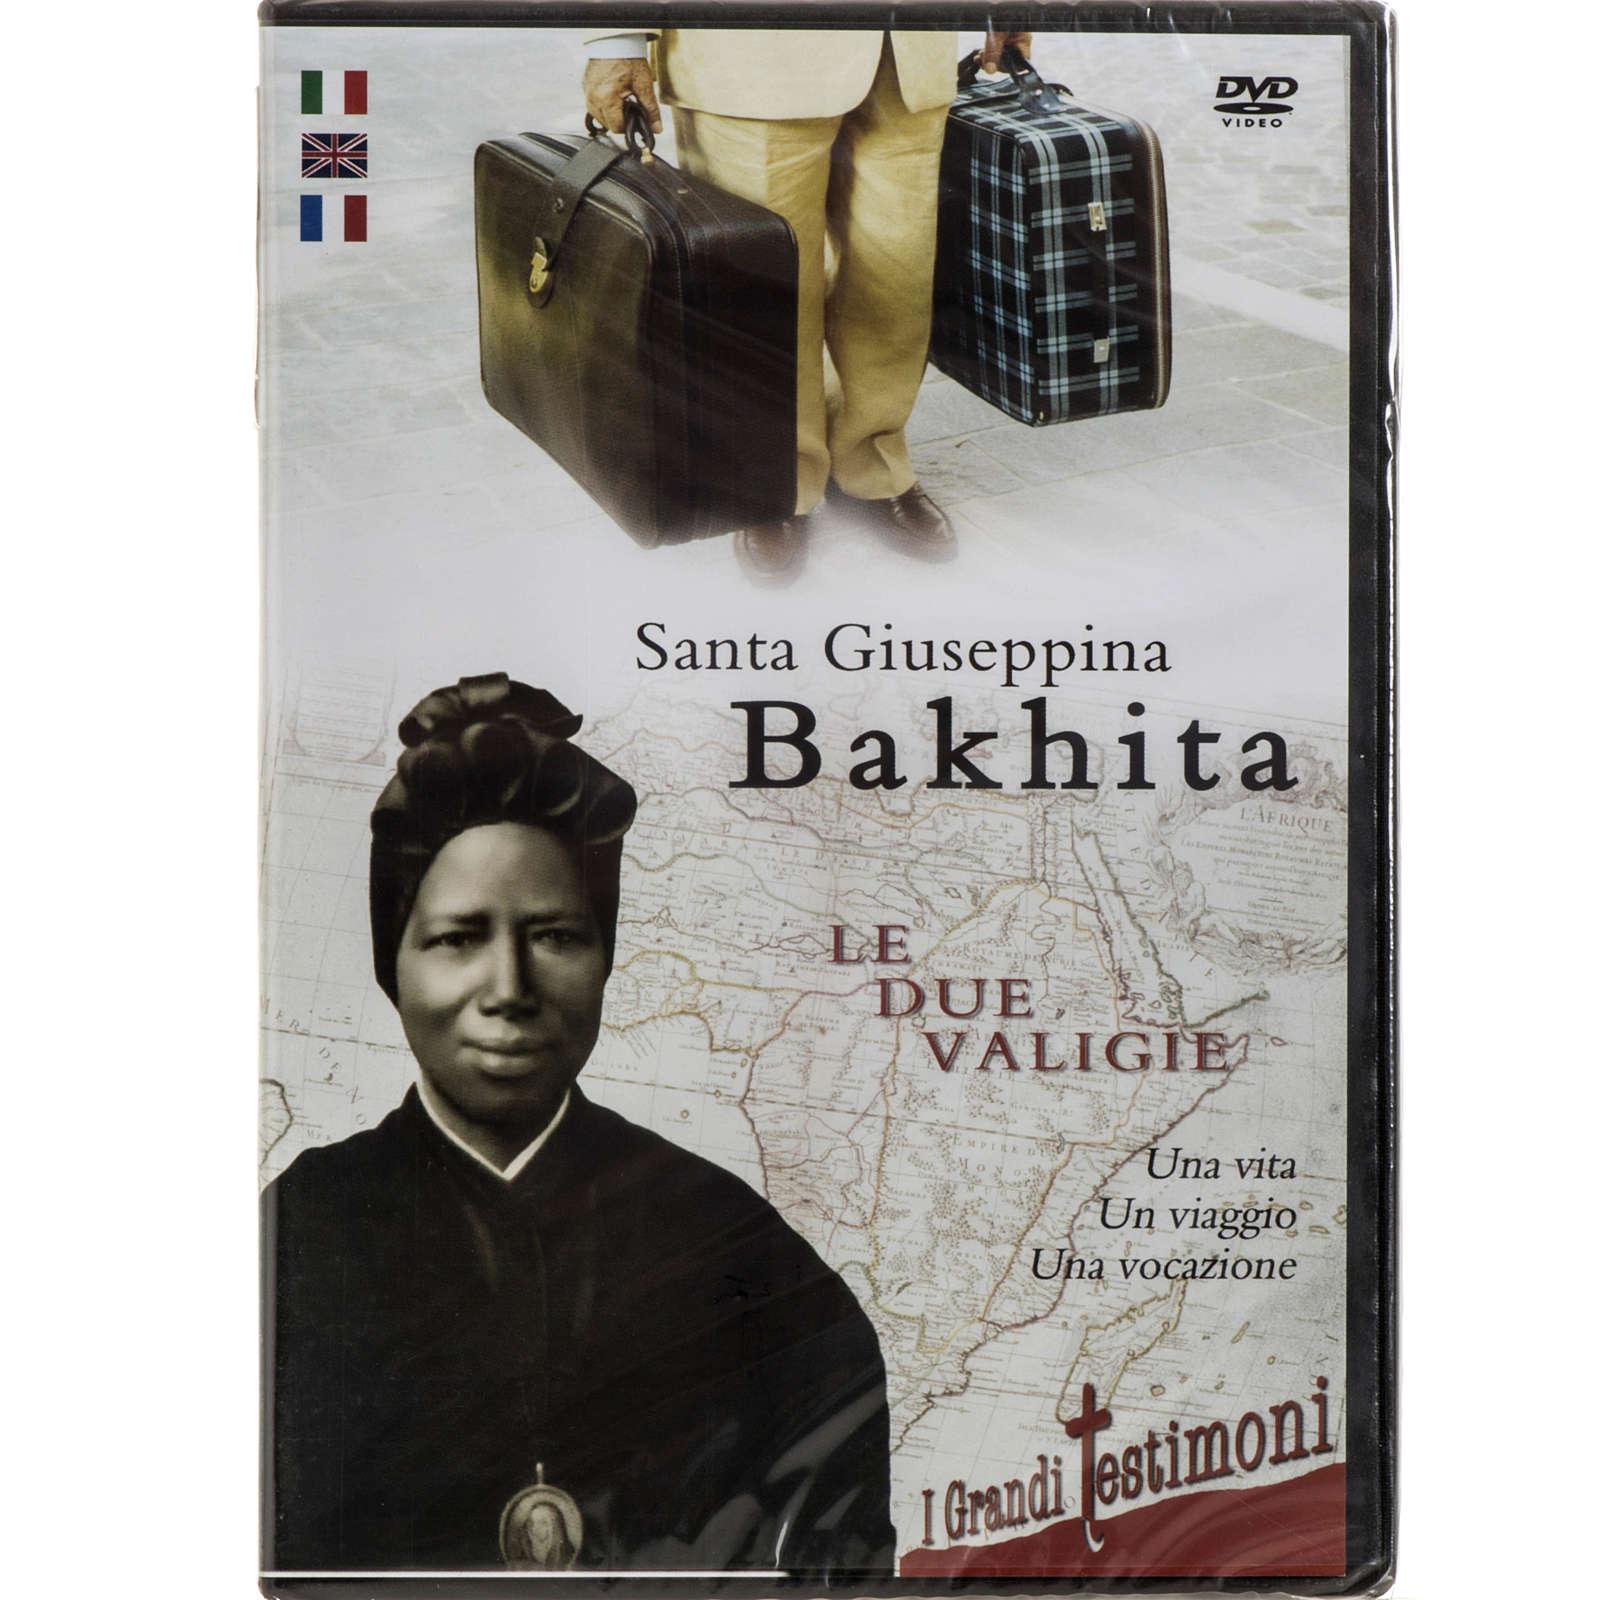 Santa Giuseppina Bakhita - le due valigie 3